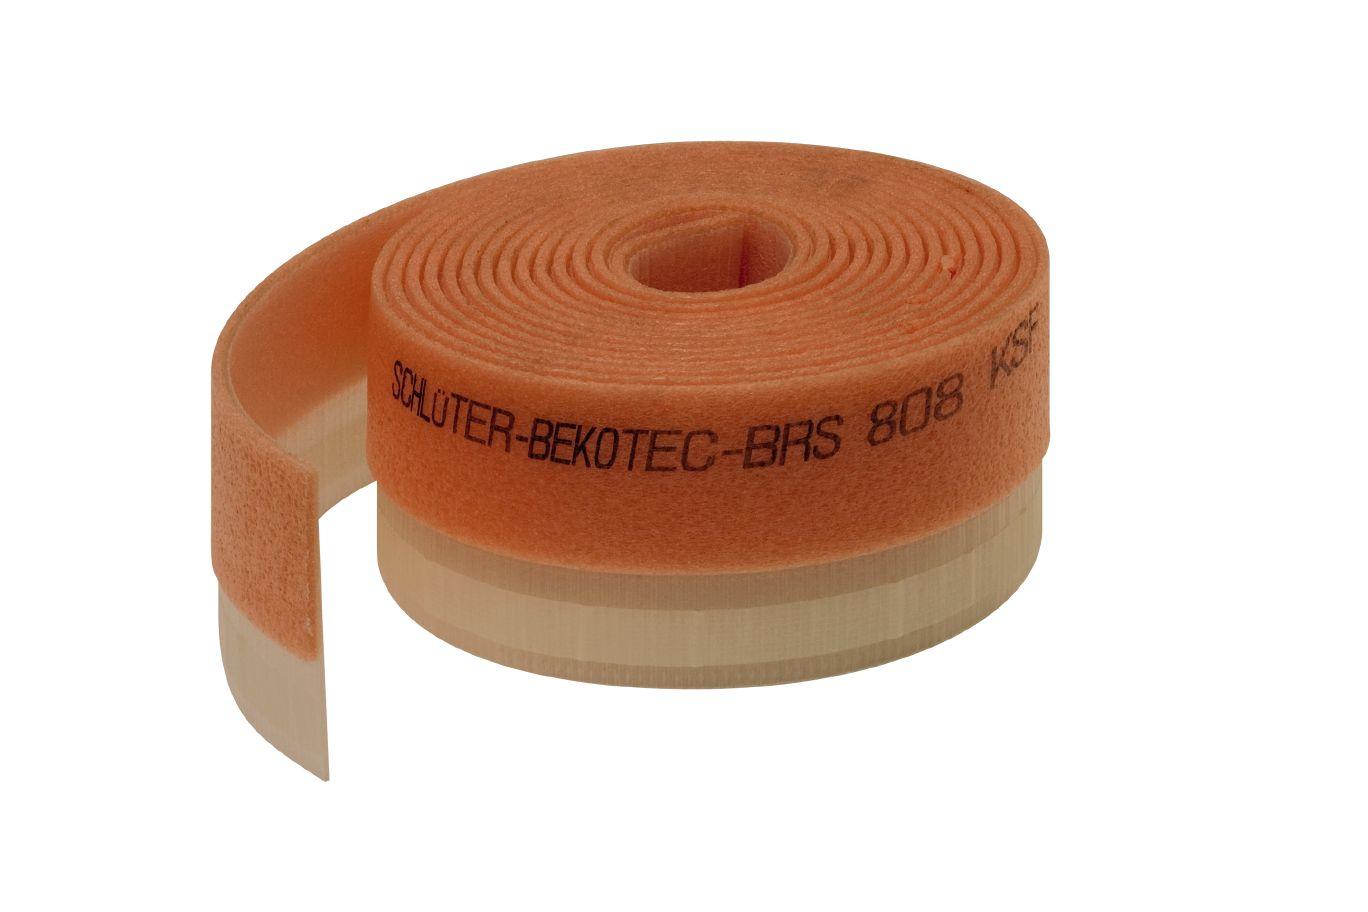 Schluter®-BEKOTEC-BRS/KSF